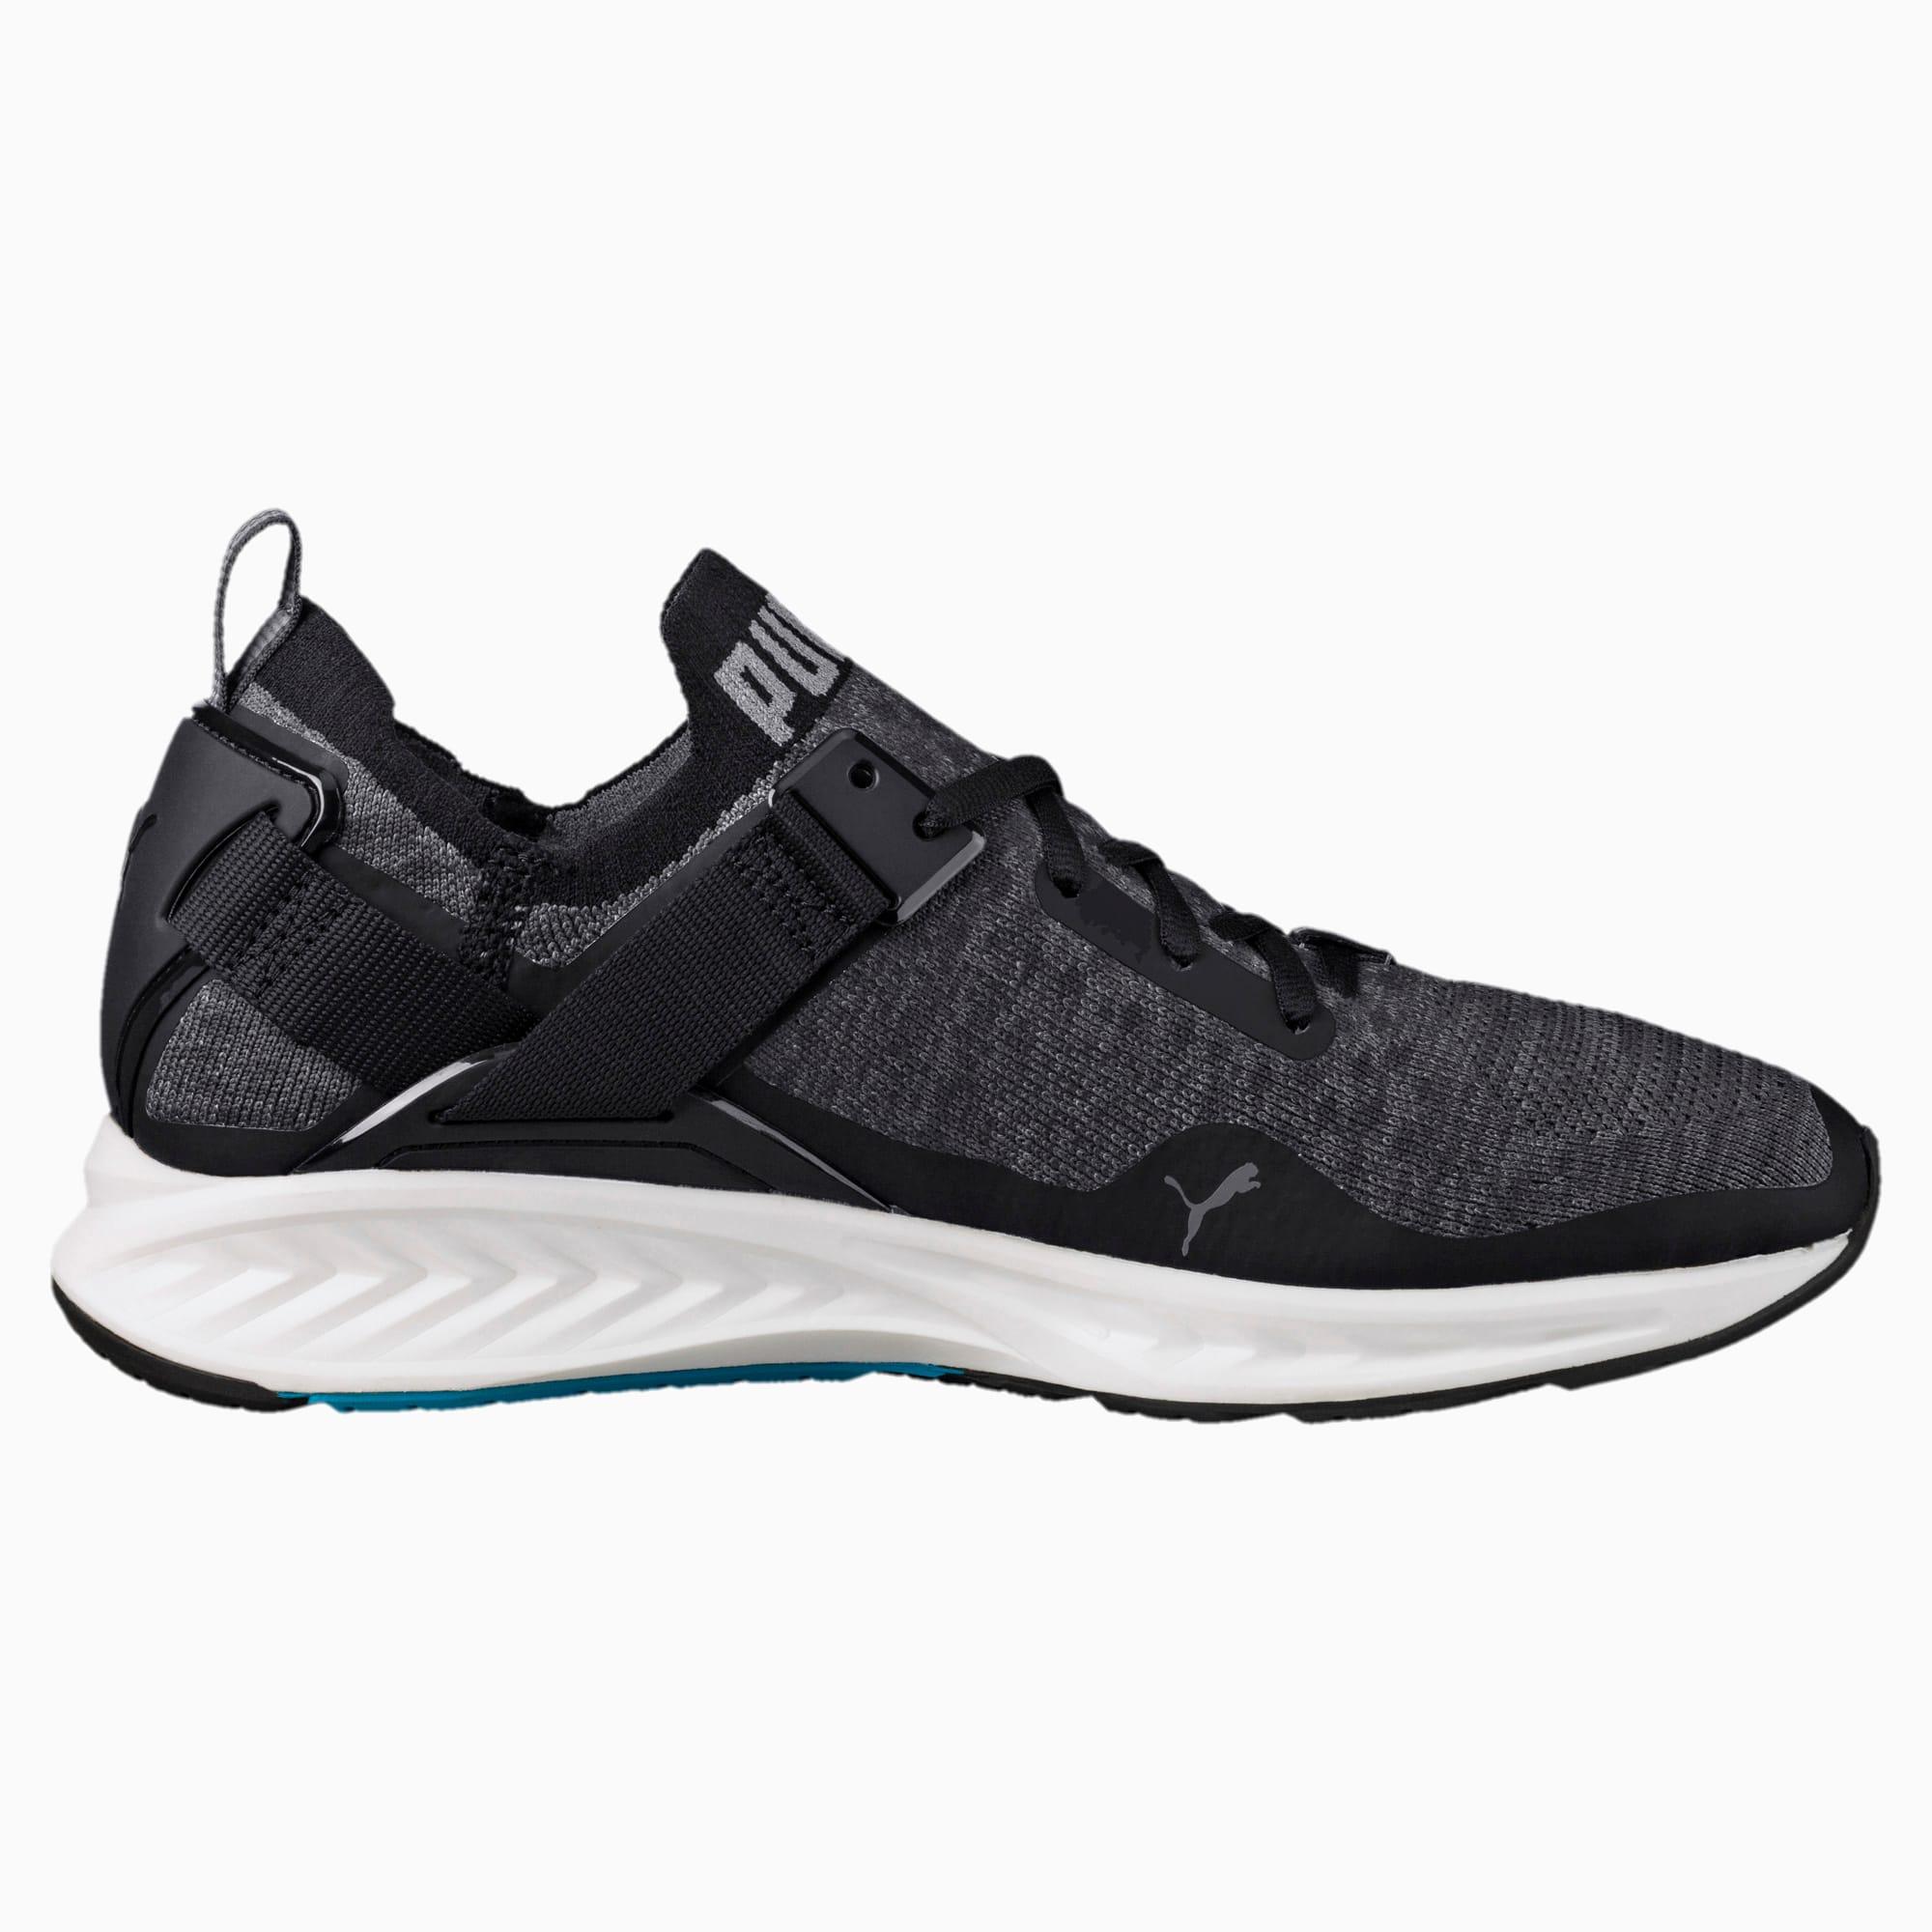 IGNITE evoKNIT Lo Men's Training Shoes